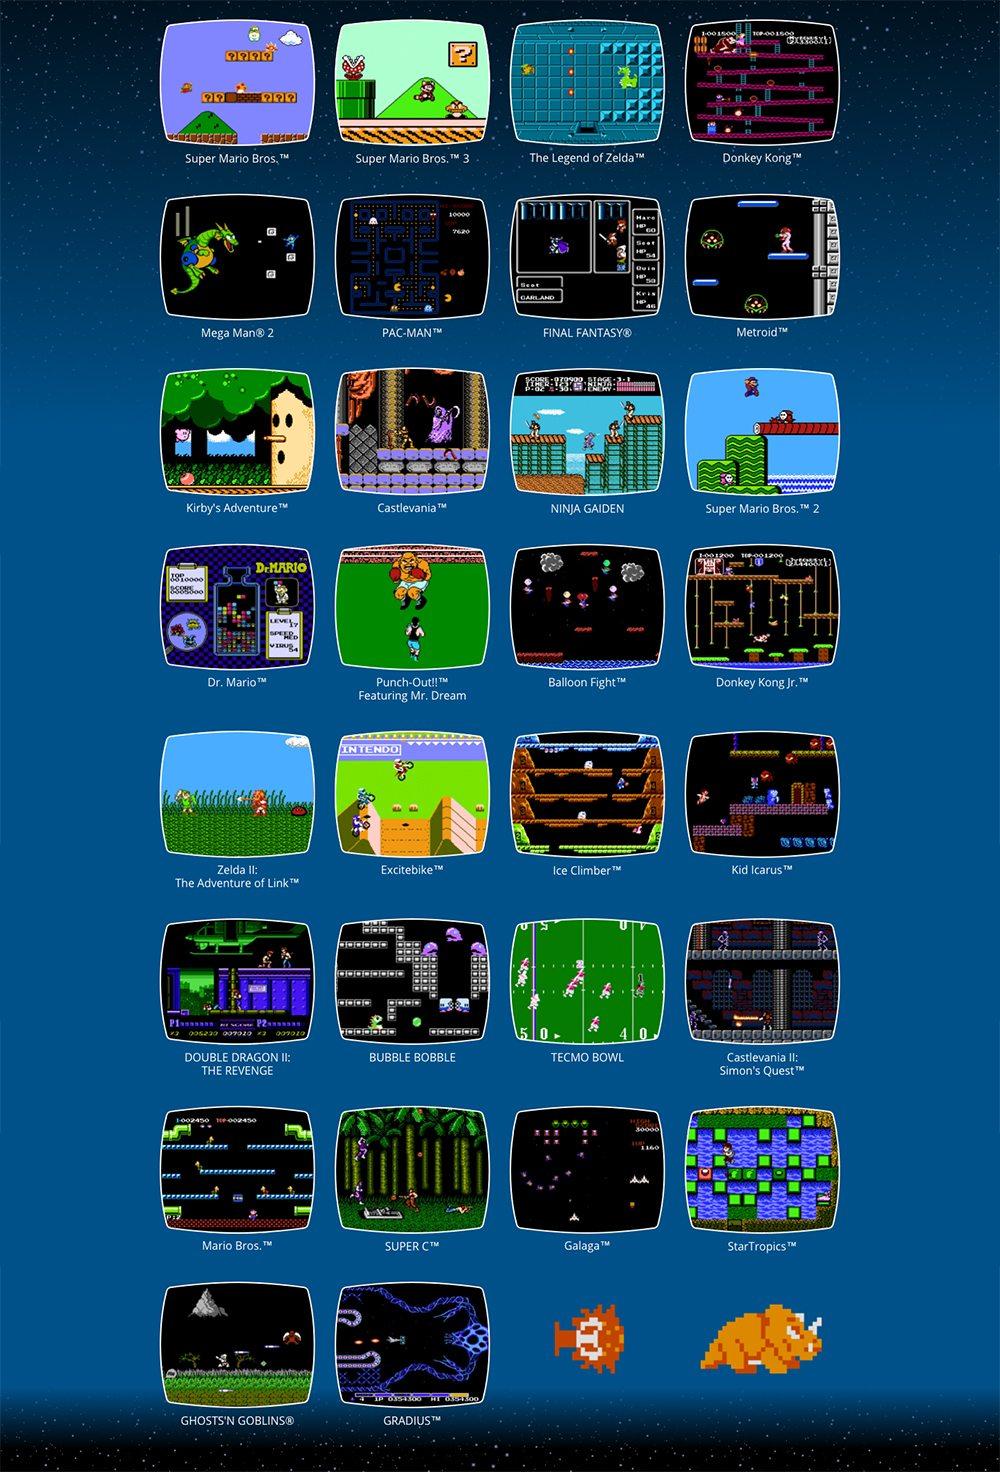 nes-classic-games-list